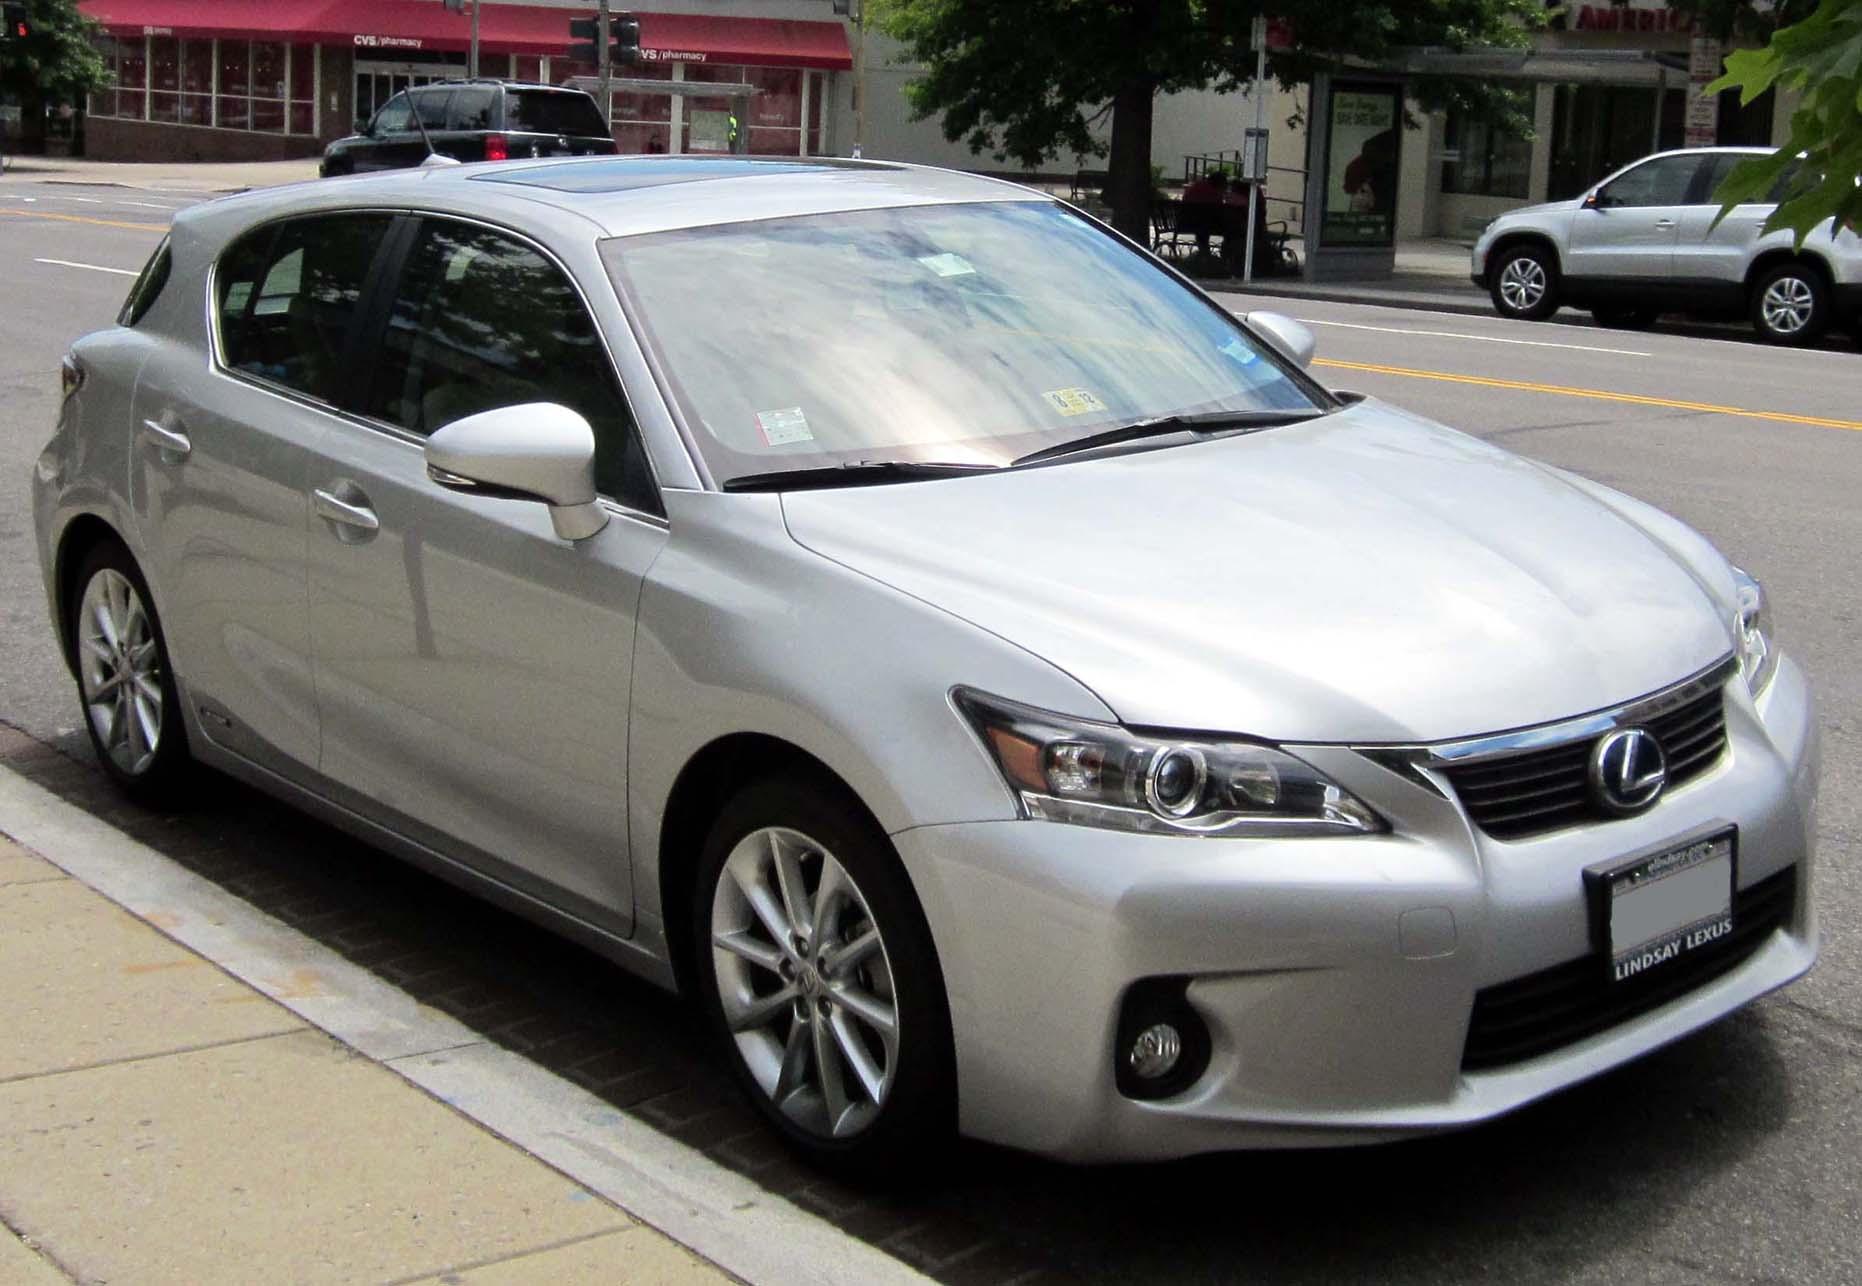 File:2012 Lexus CT200h    05 20 2012.JPG